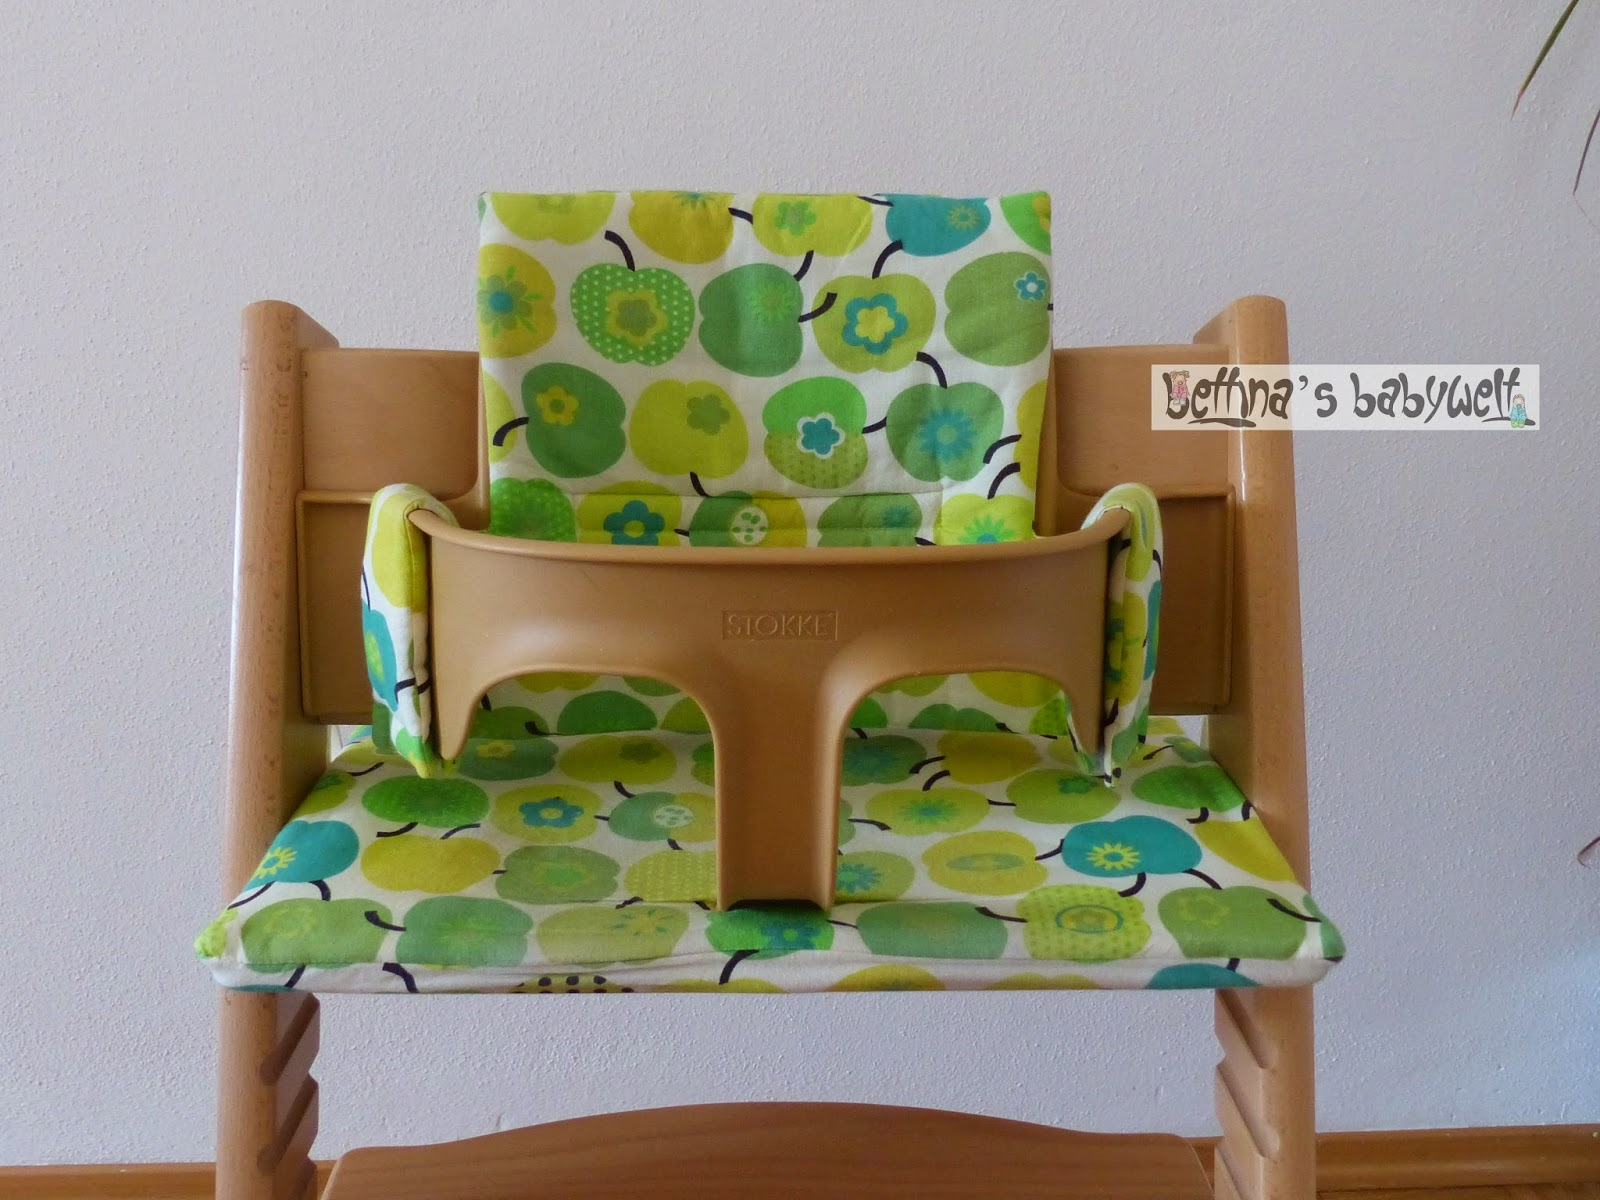 bettina 39 s babywelt tripptrapp sitzkissen. Black Bedroom Furniture Sets. Home Design Ideas